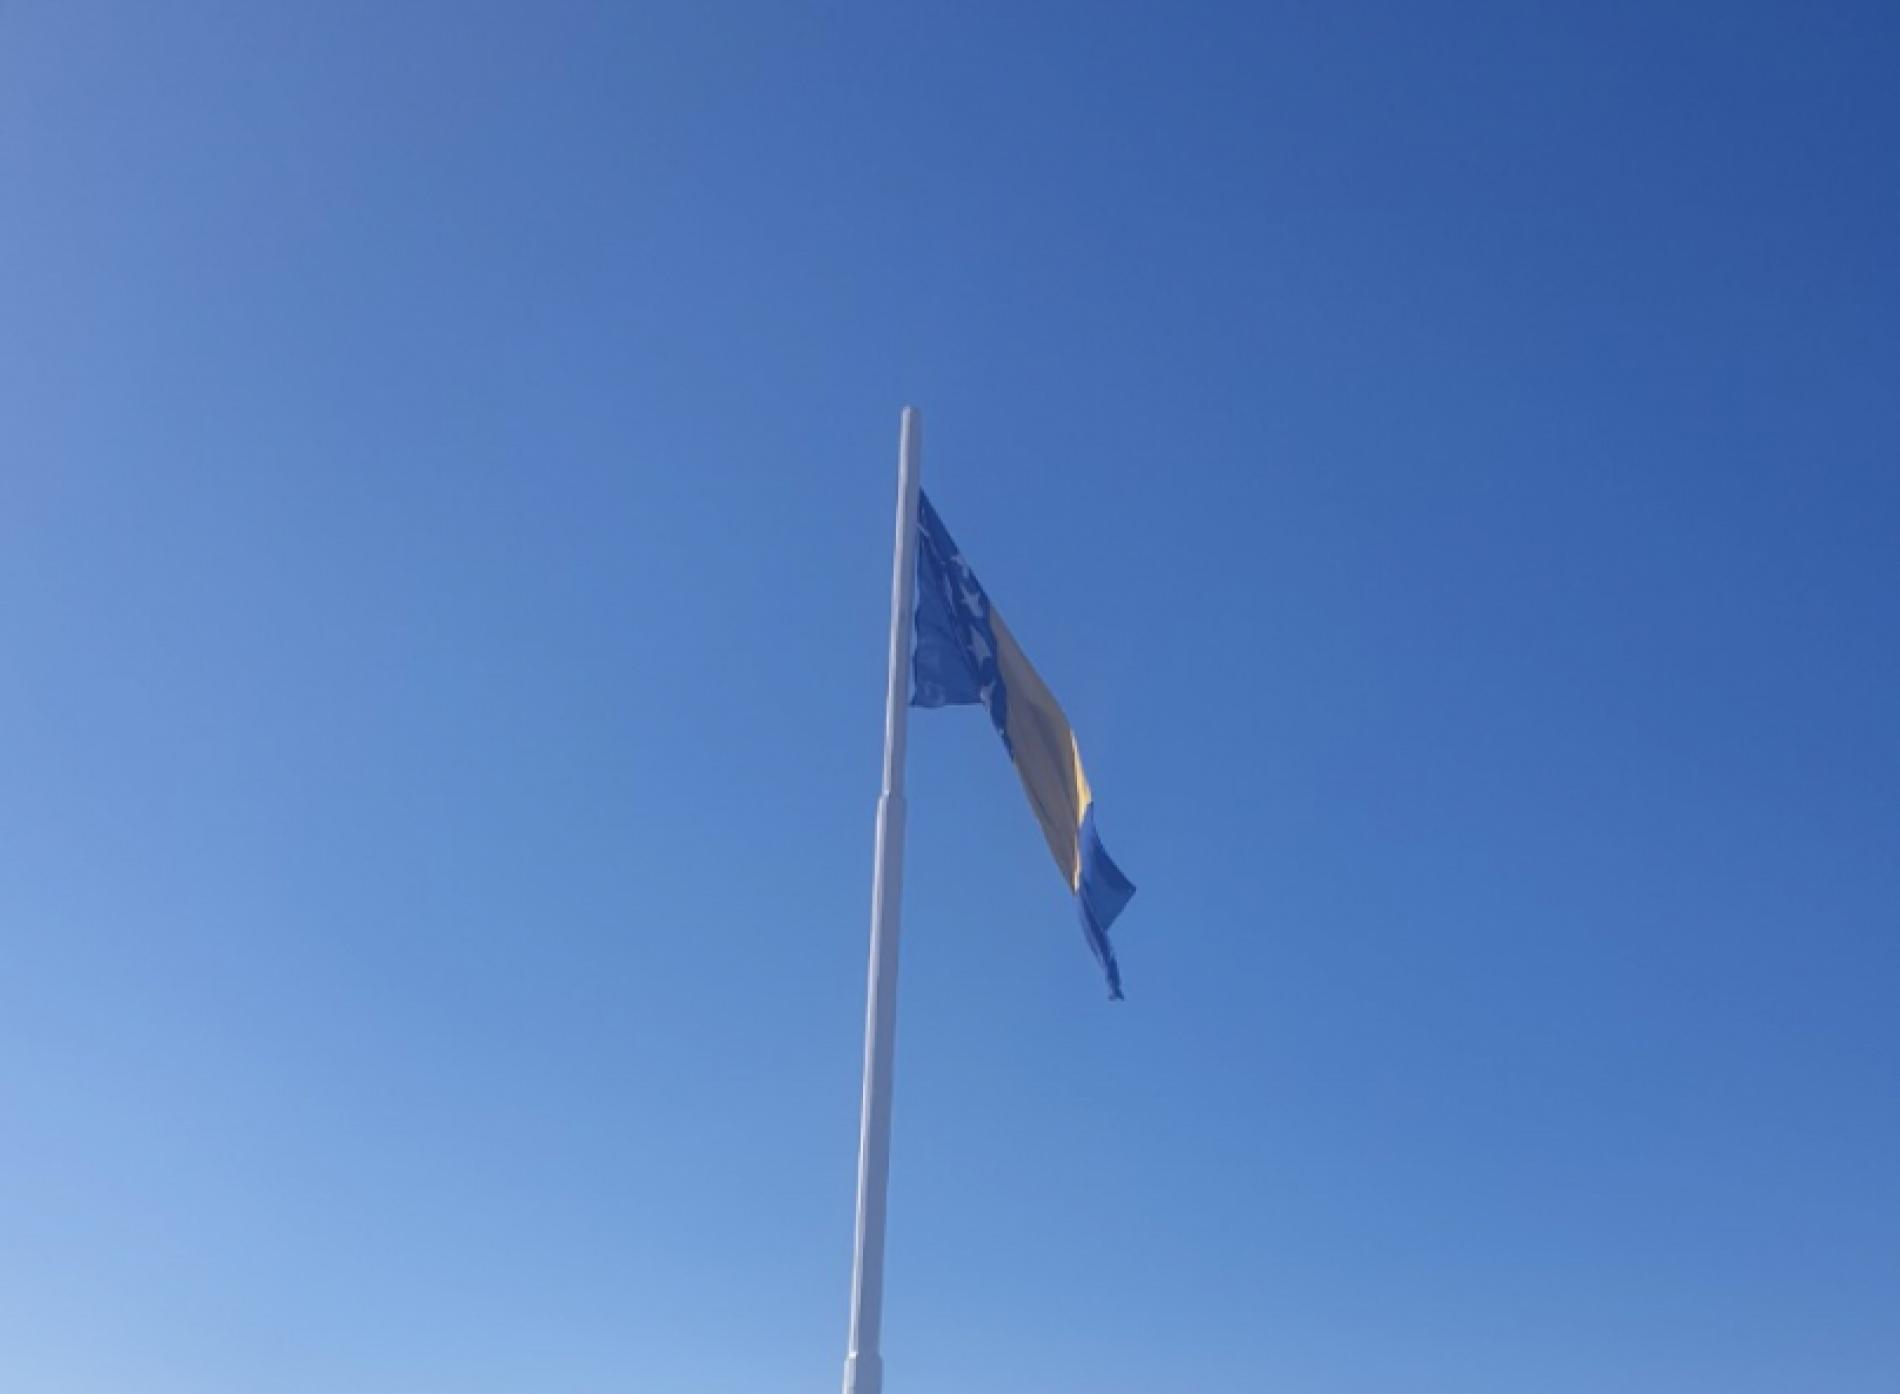 Dragan Bursać: Srećan ti Dan nezavisnosti moja domovino